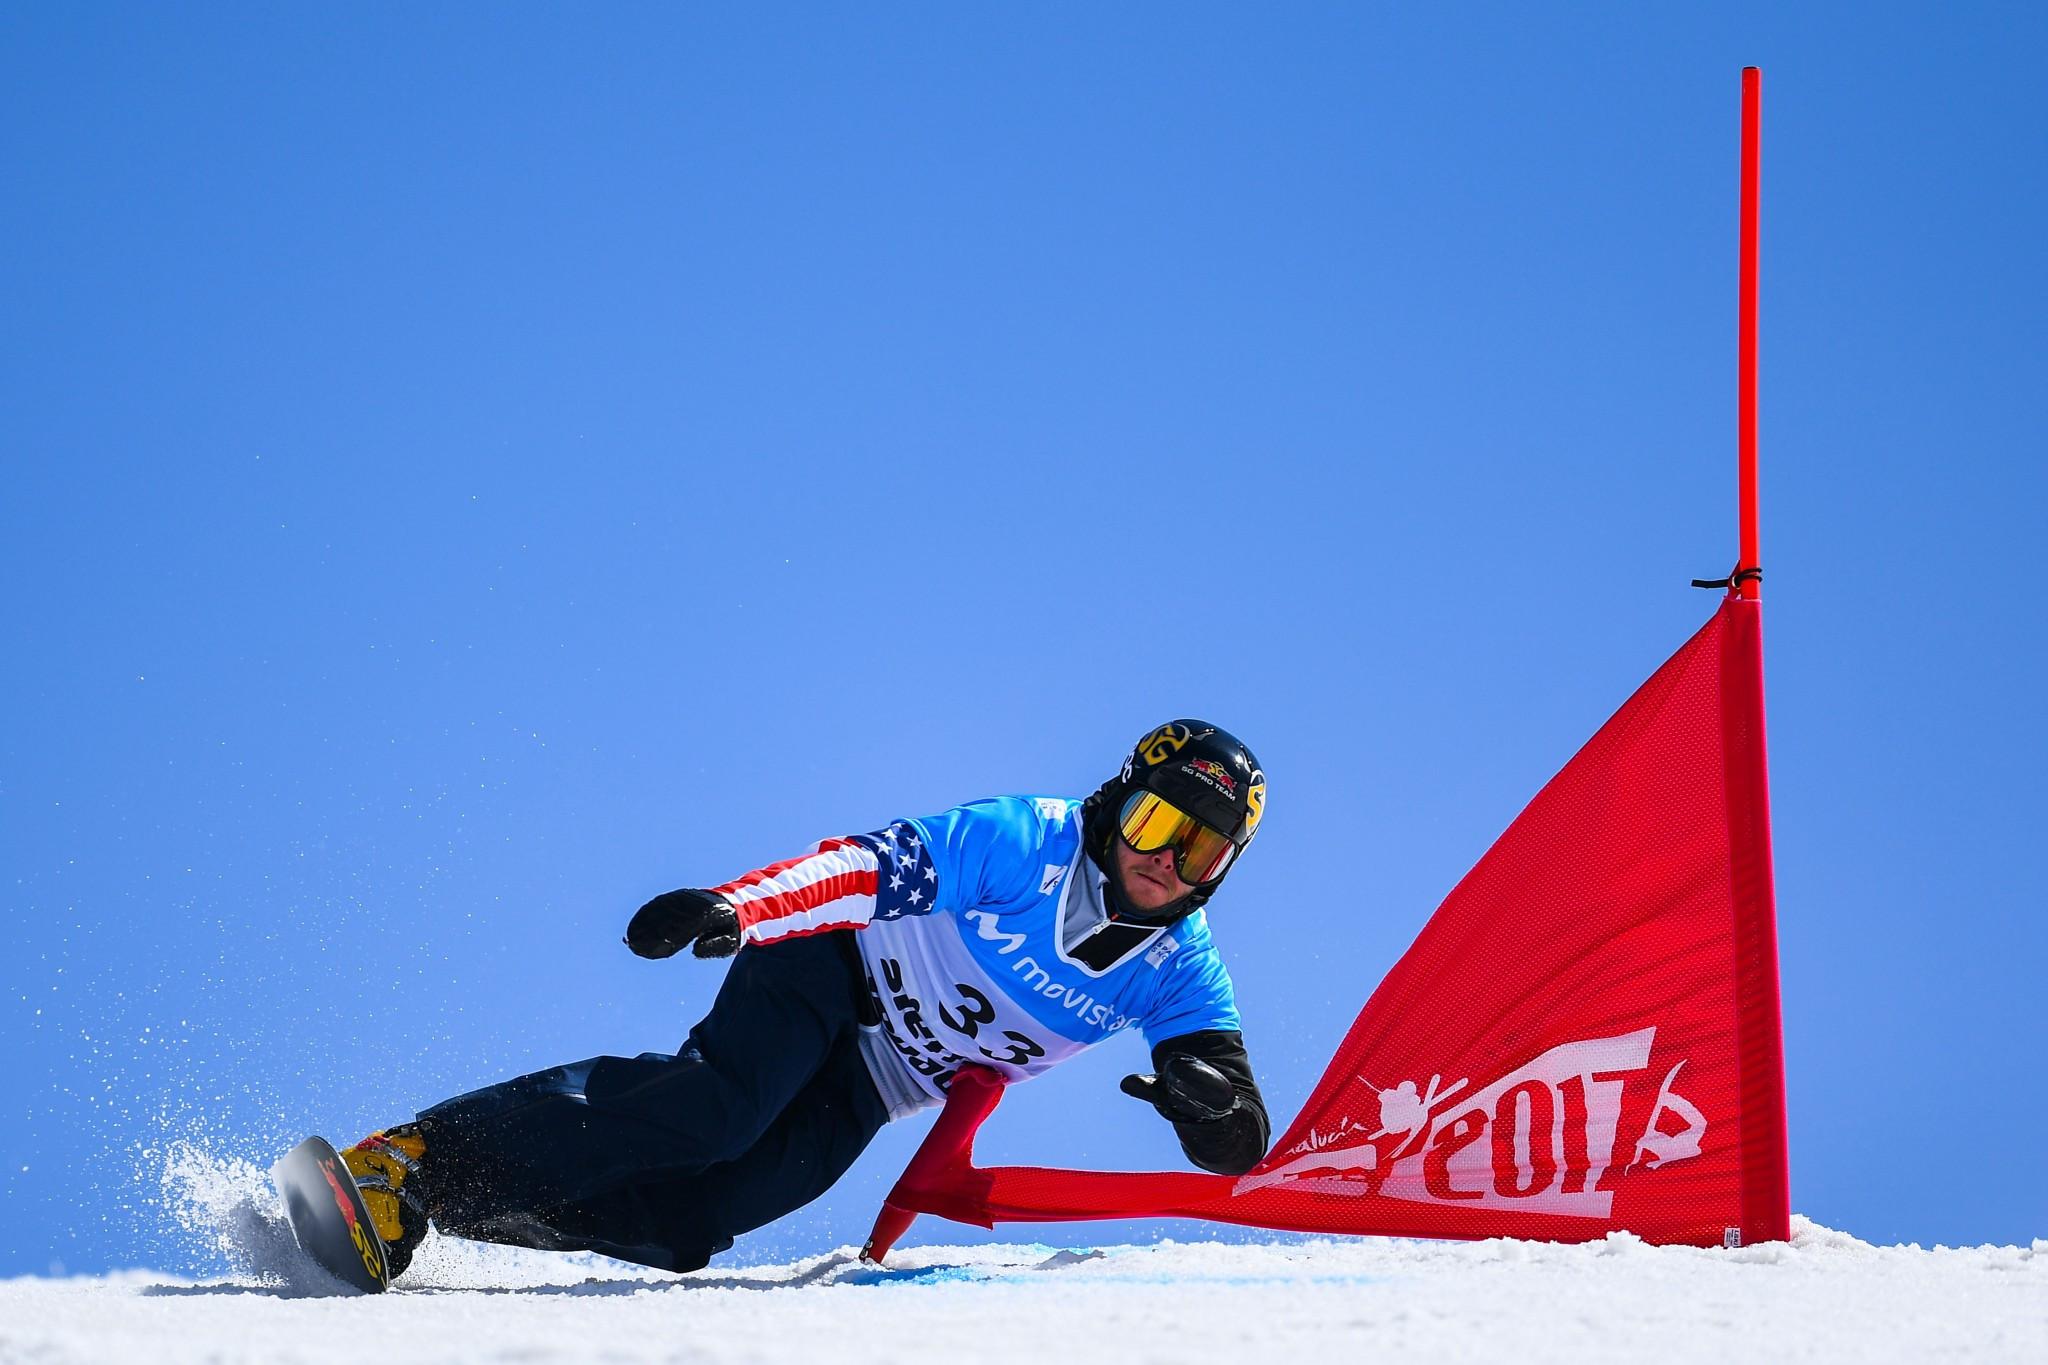 American snowboarder Reiter announces retirement